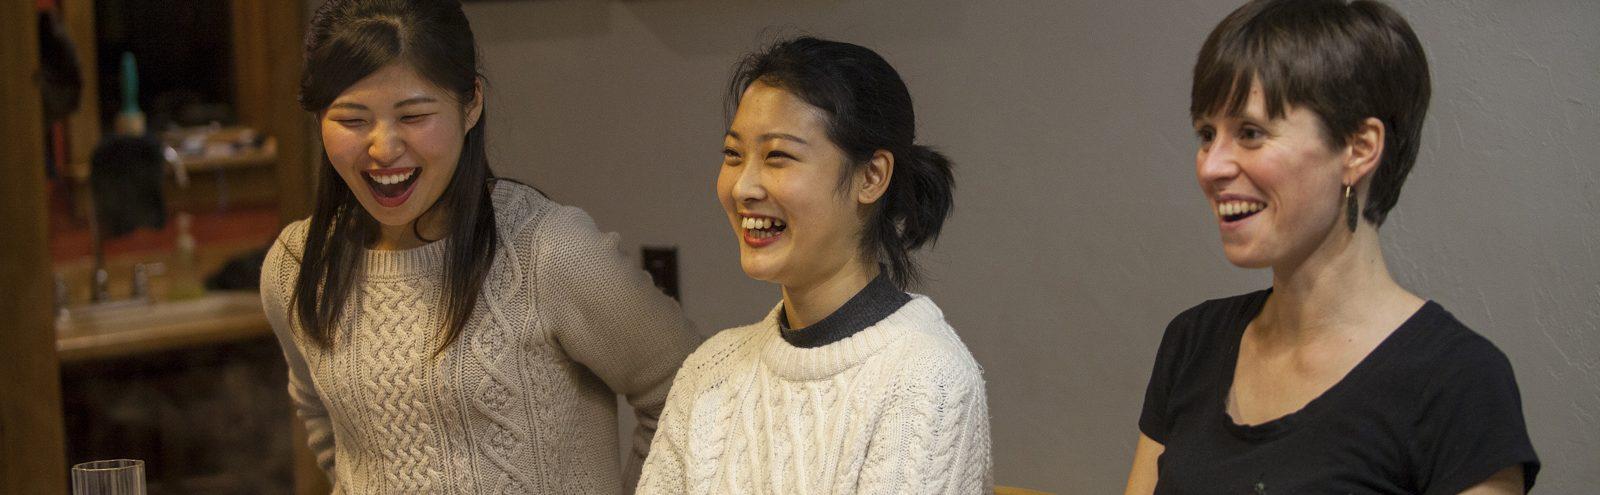 Northland College Japanese exchange students